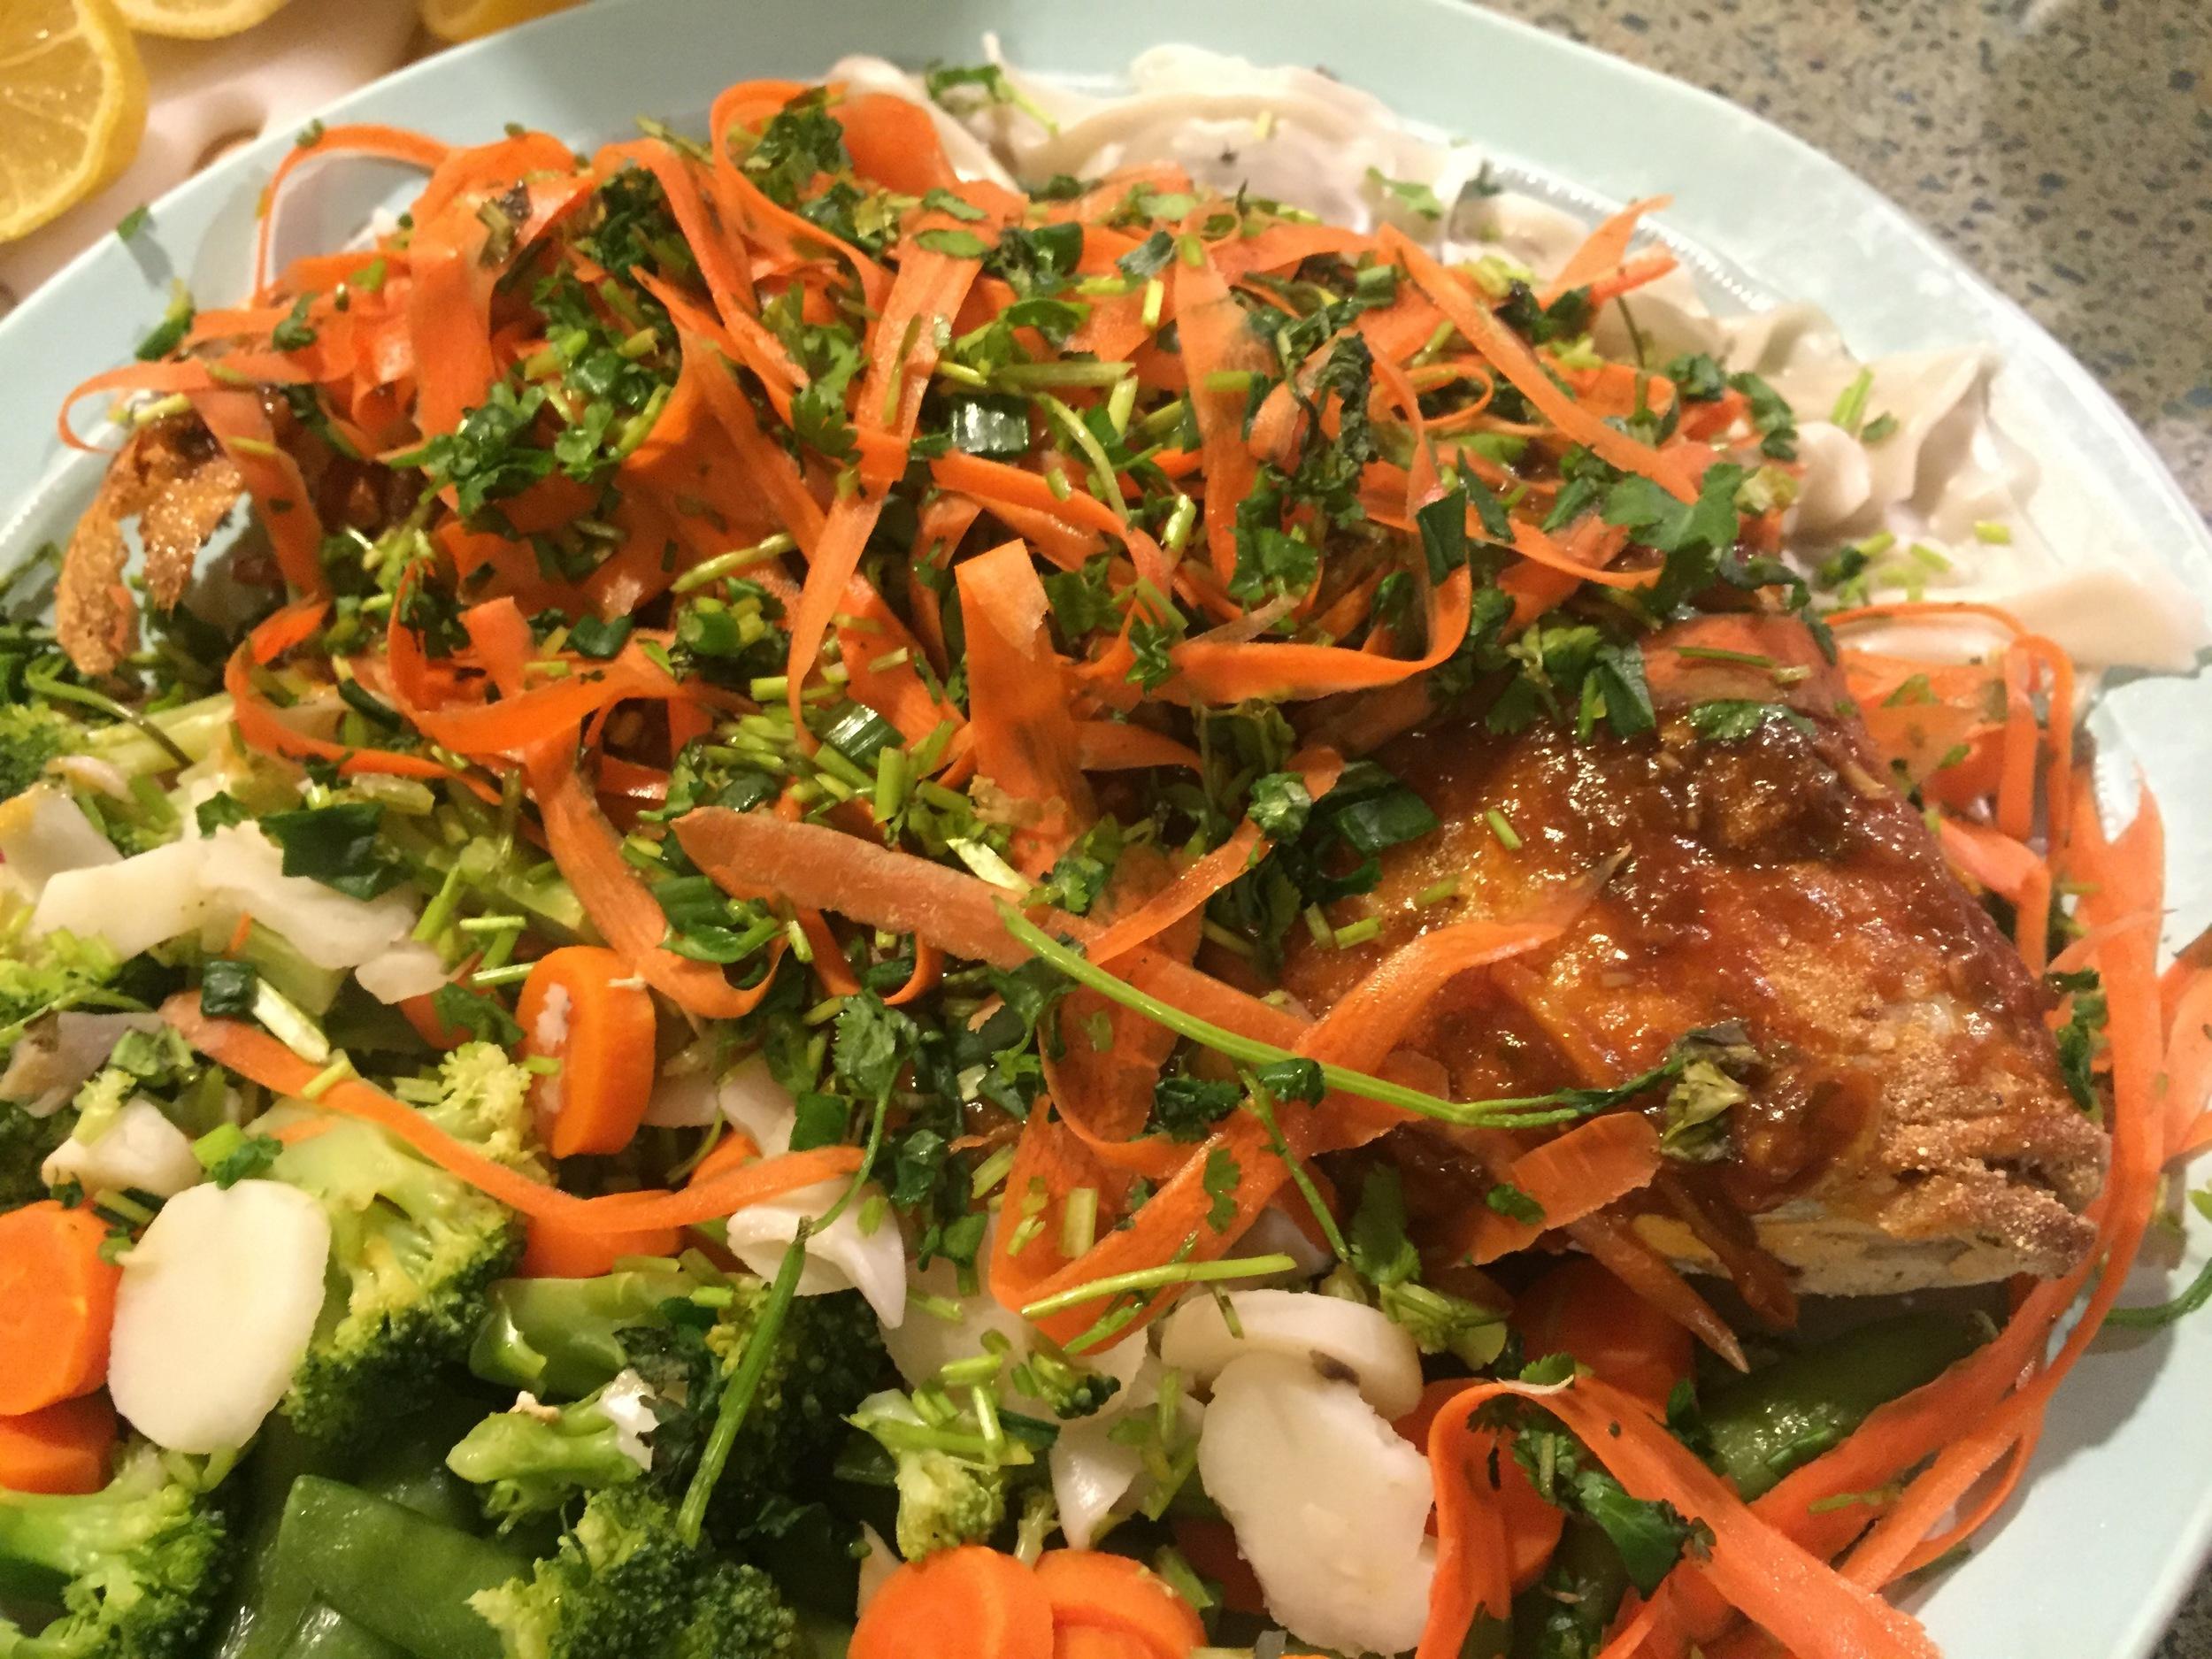 Whole Crispy Fish with Liao's Food Chile Chutney                                         Photo by Rachel J. Weston